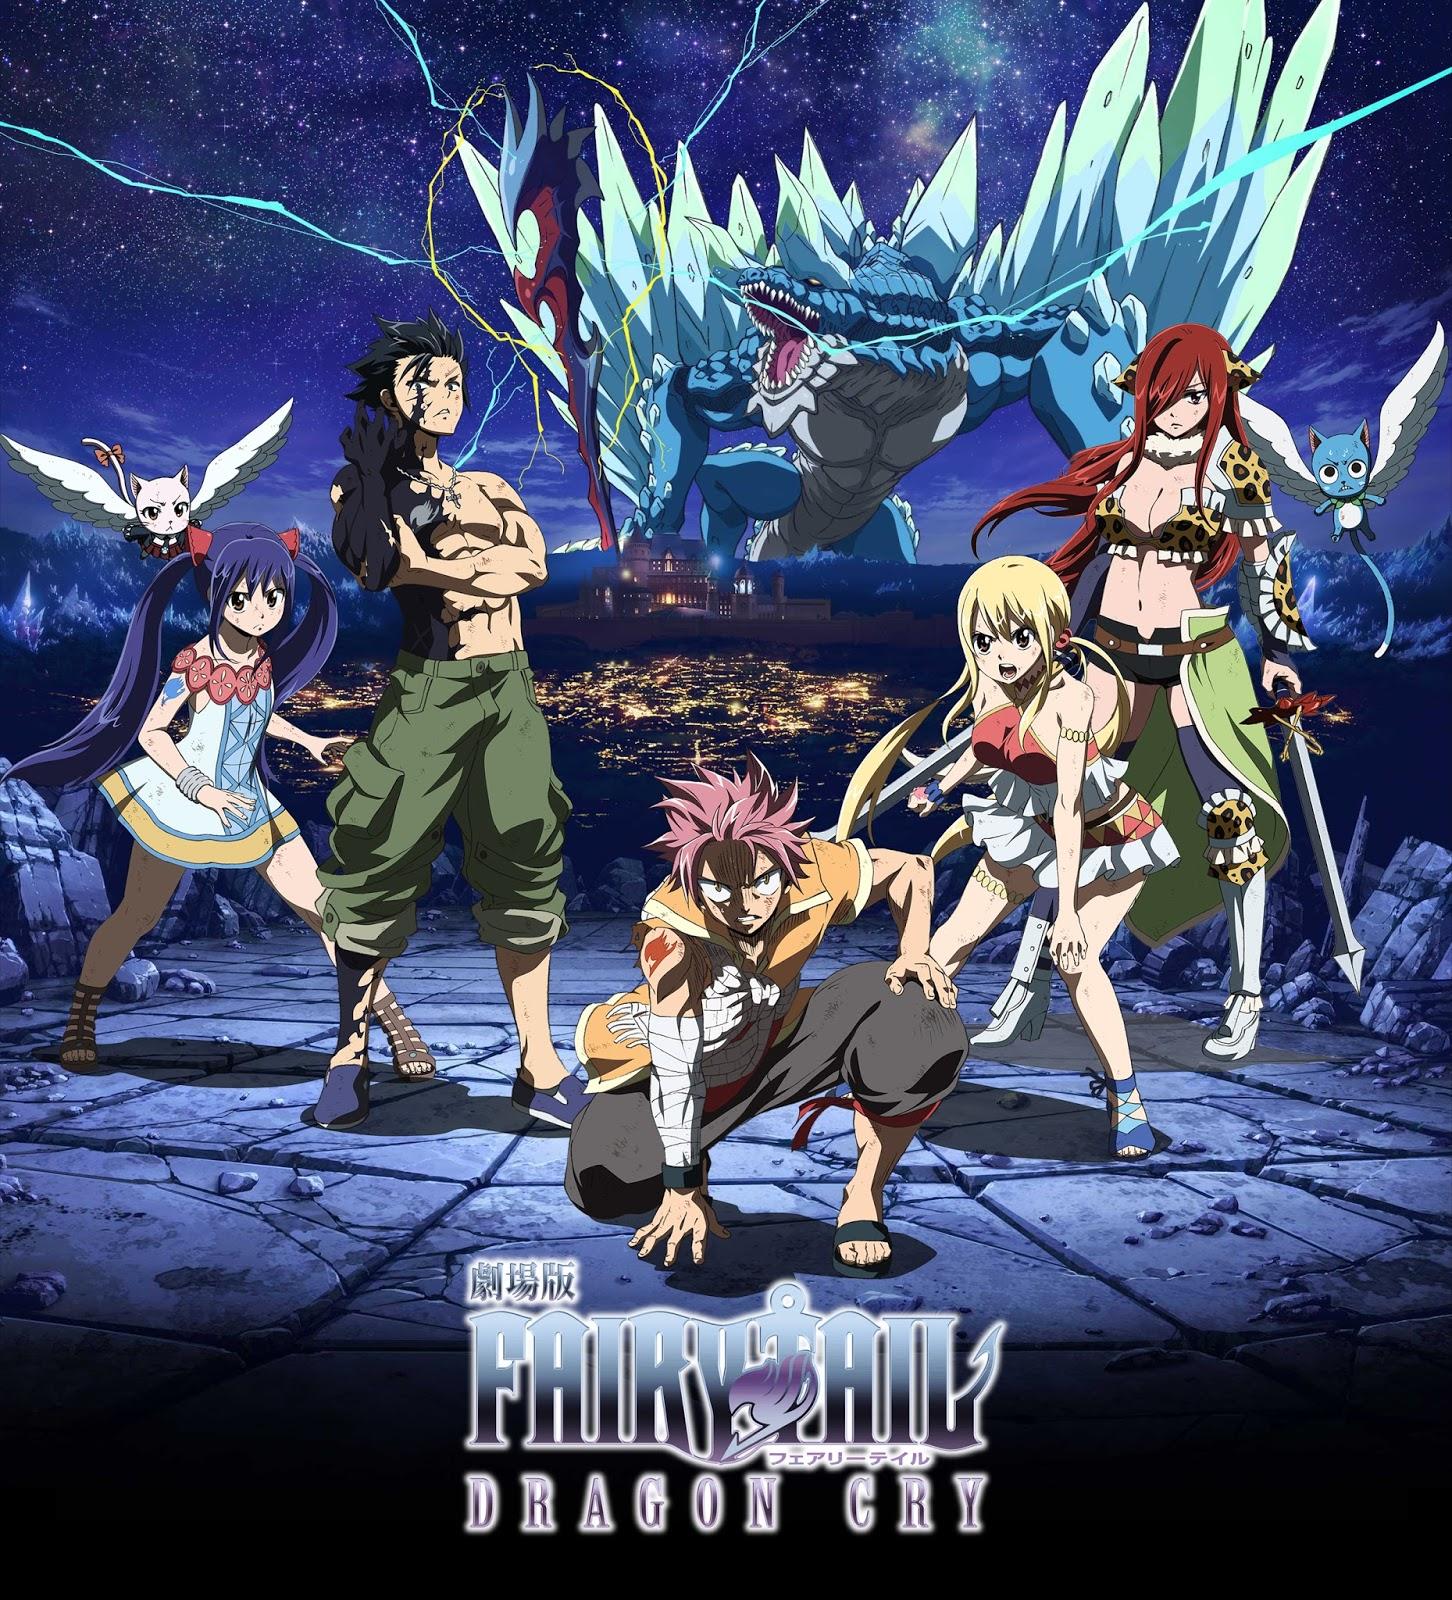 Fairy Tail Dragon Cry Full Movie Ger Sub